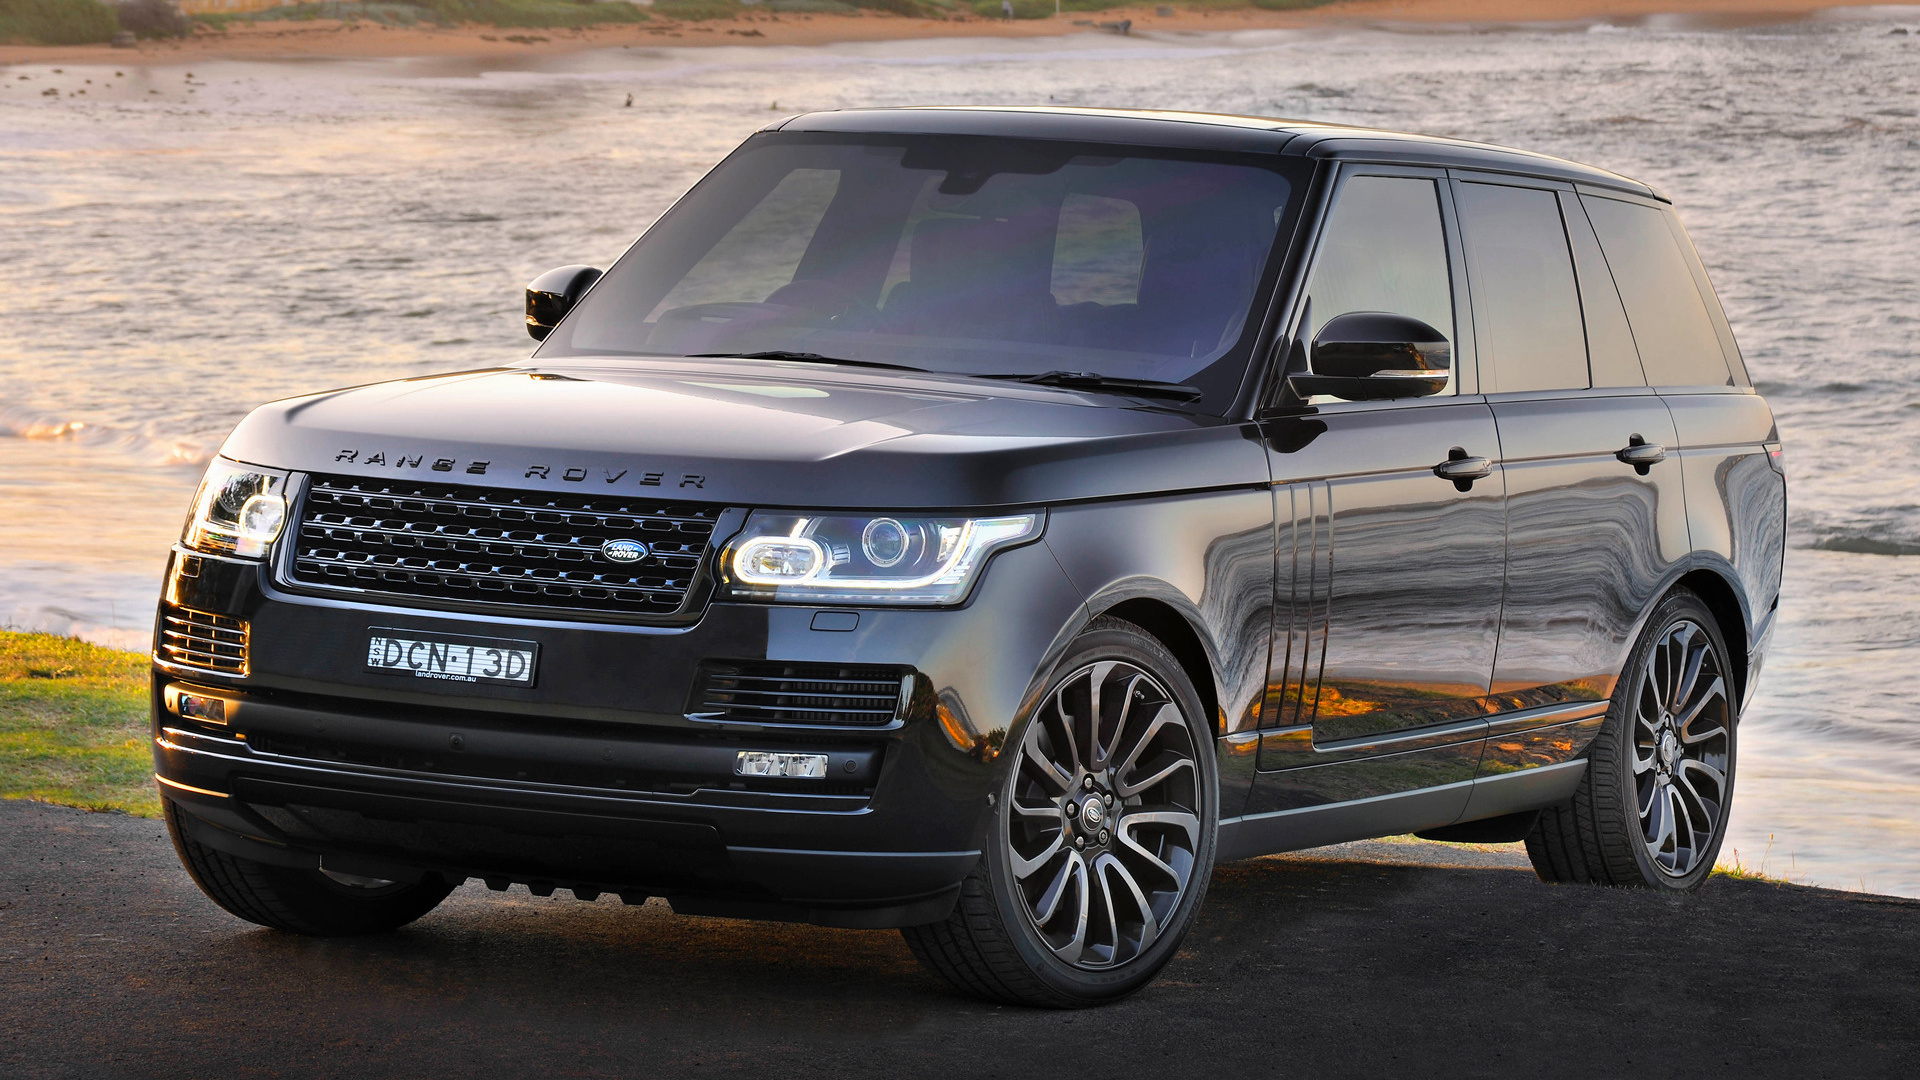 Range Rover Autobiography >> 2013 Range Rover Vogue SE Black Design Pack (AU ...